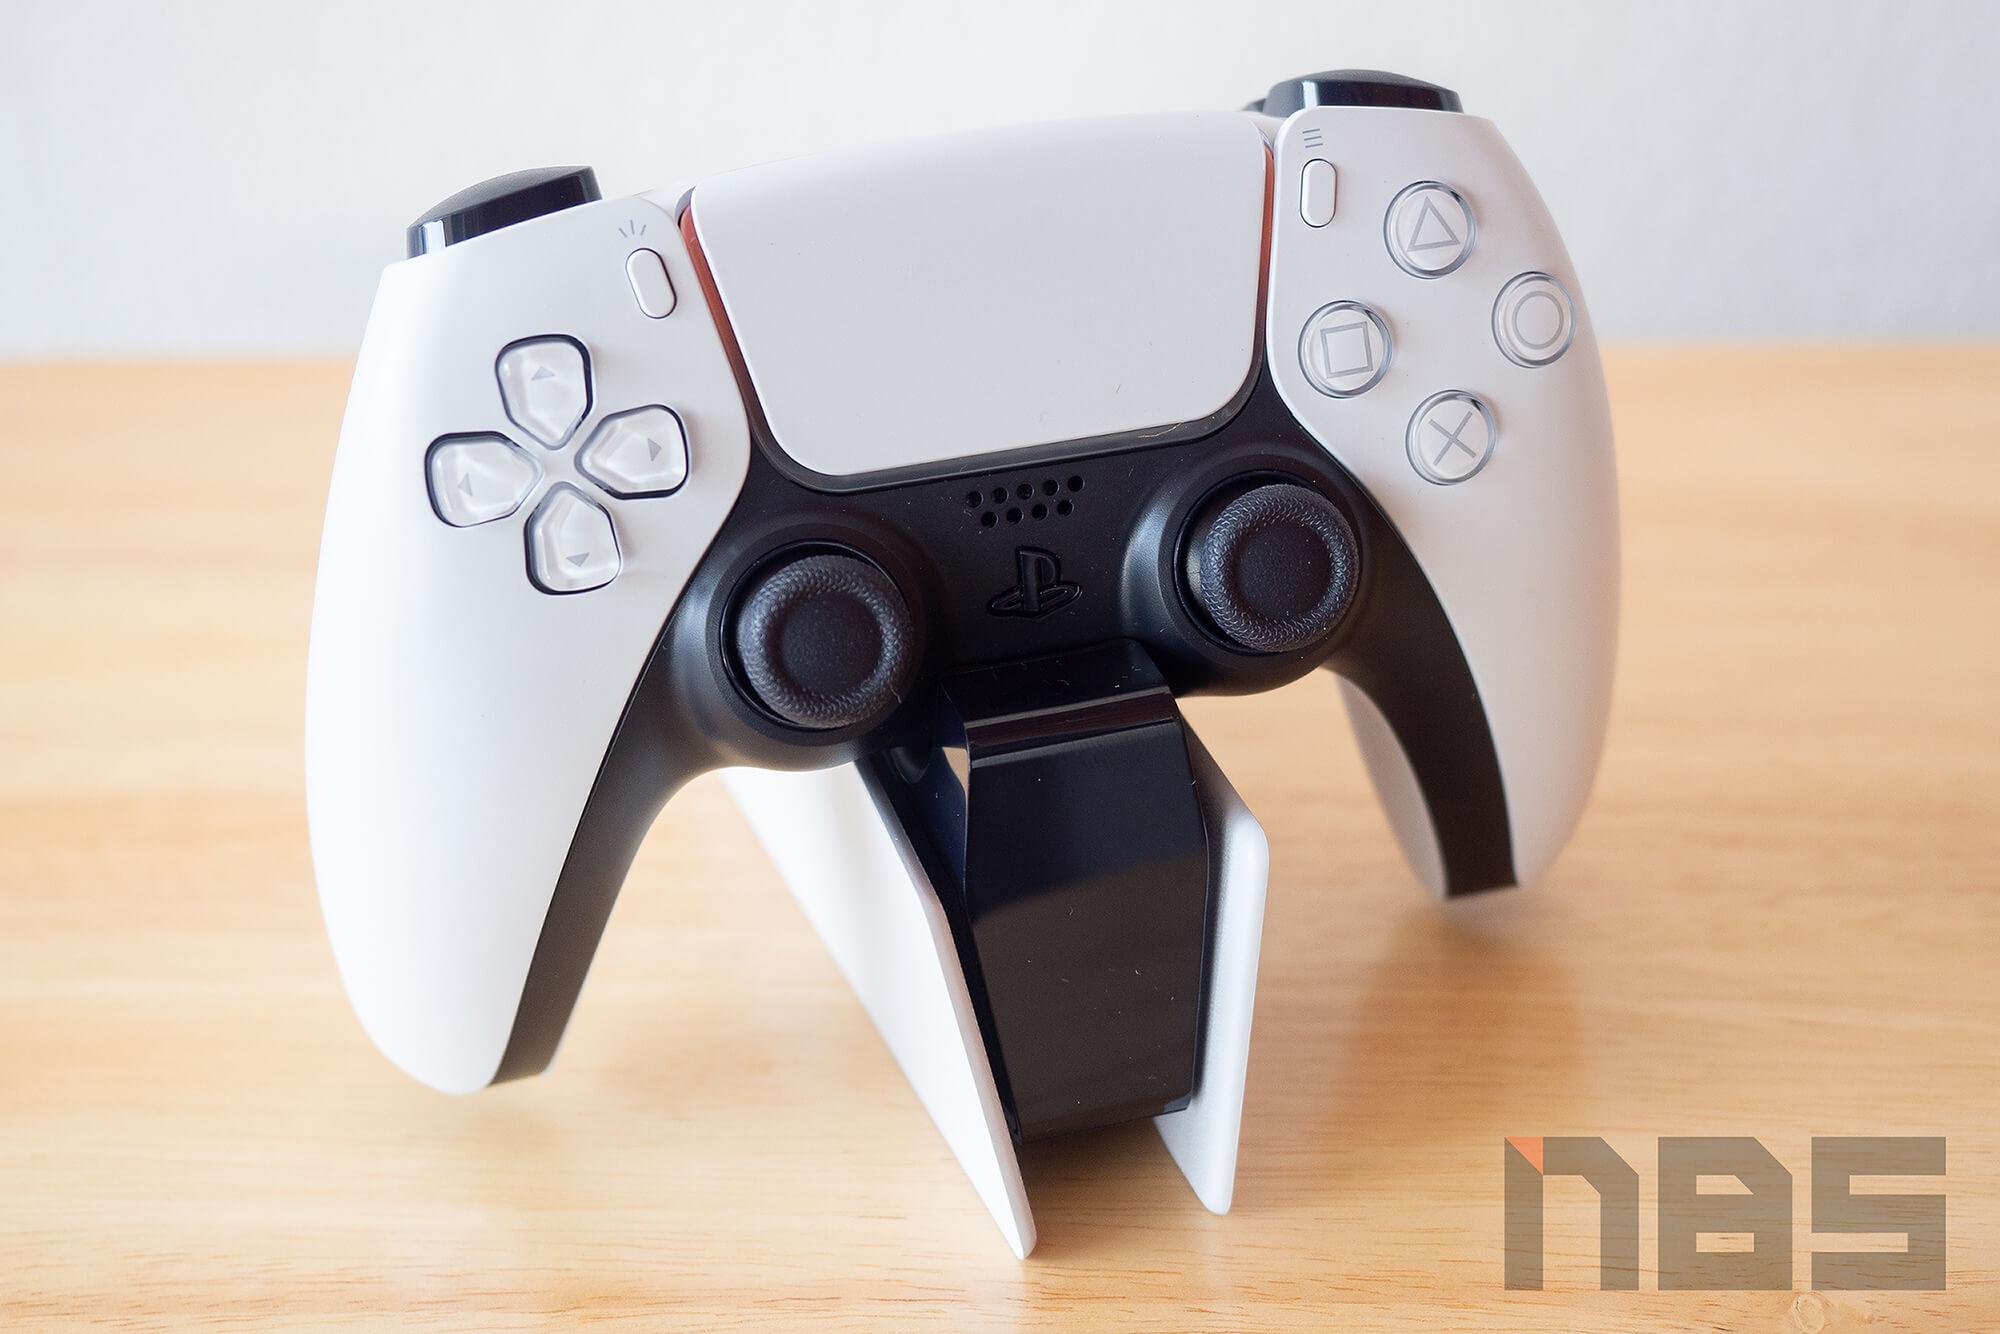 Review PlayStation 5 DualSense Charging Station NotebookSPEC 14